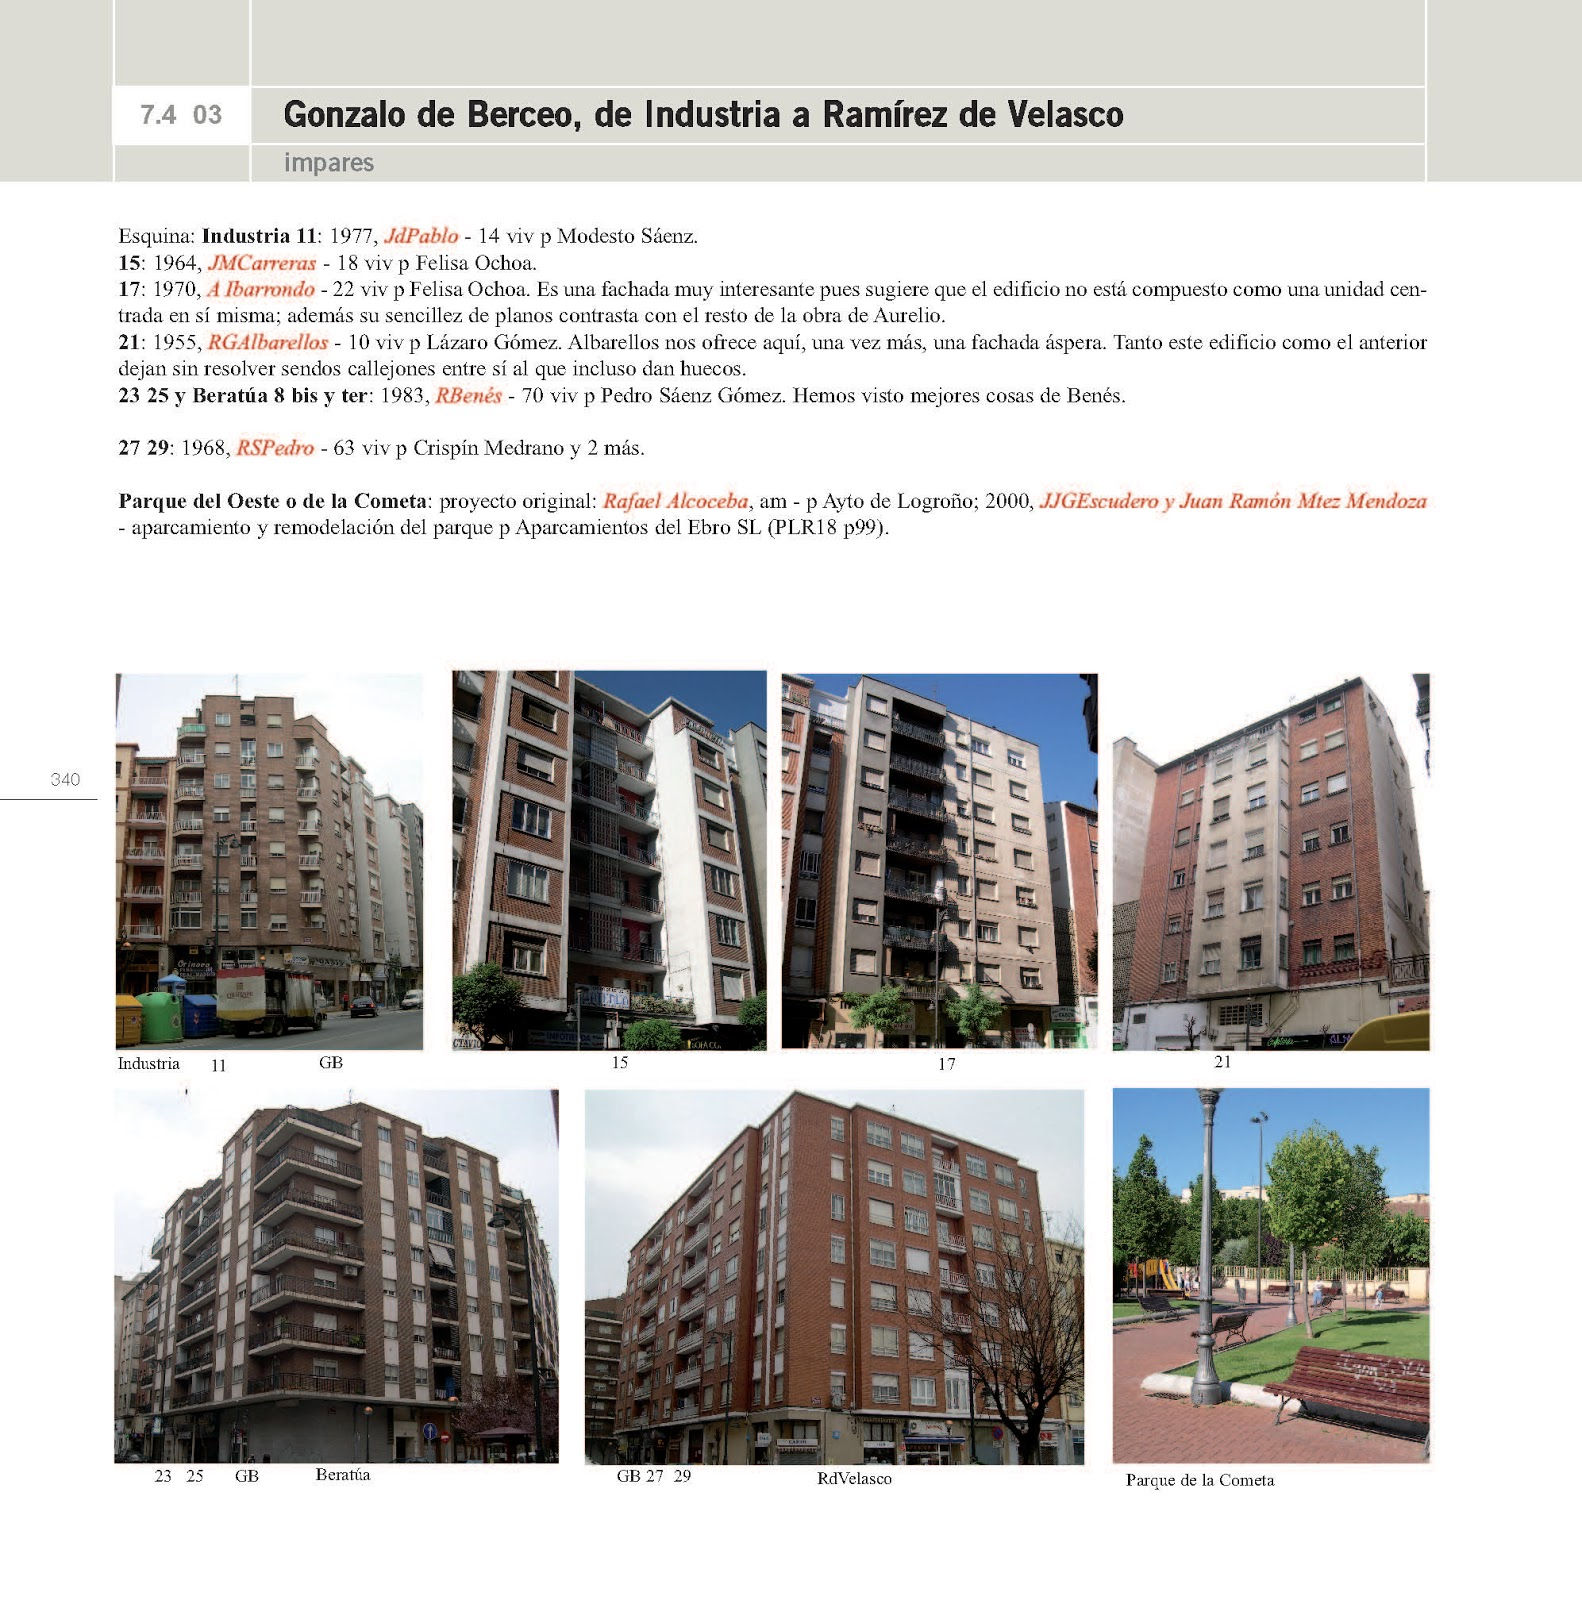 Guia De Arquitectura De Logro O Paginas 7 4 03 Gonzalo